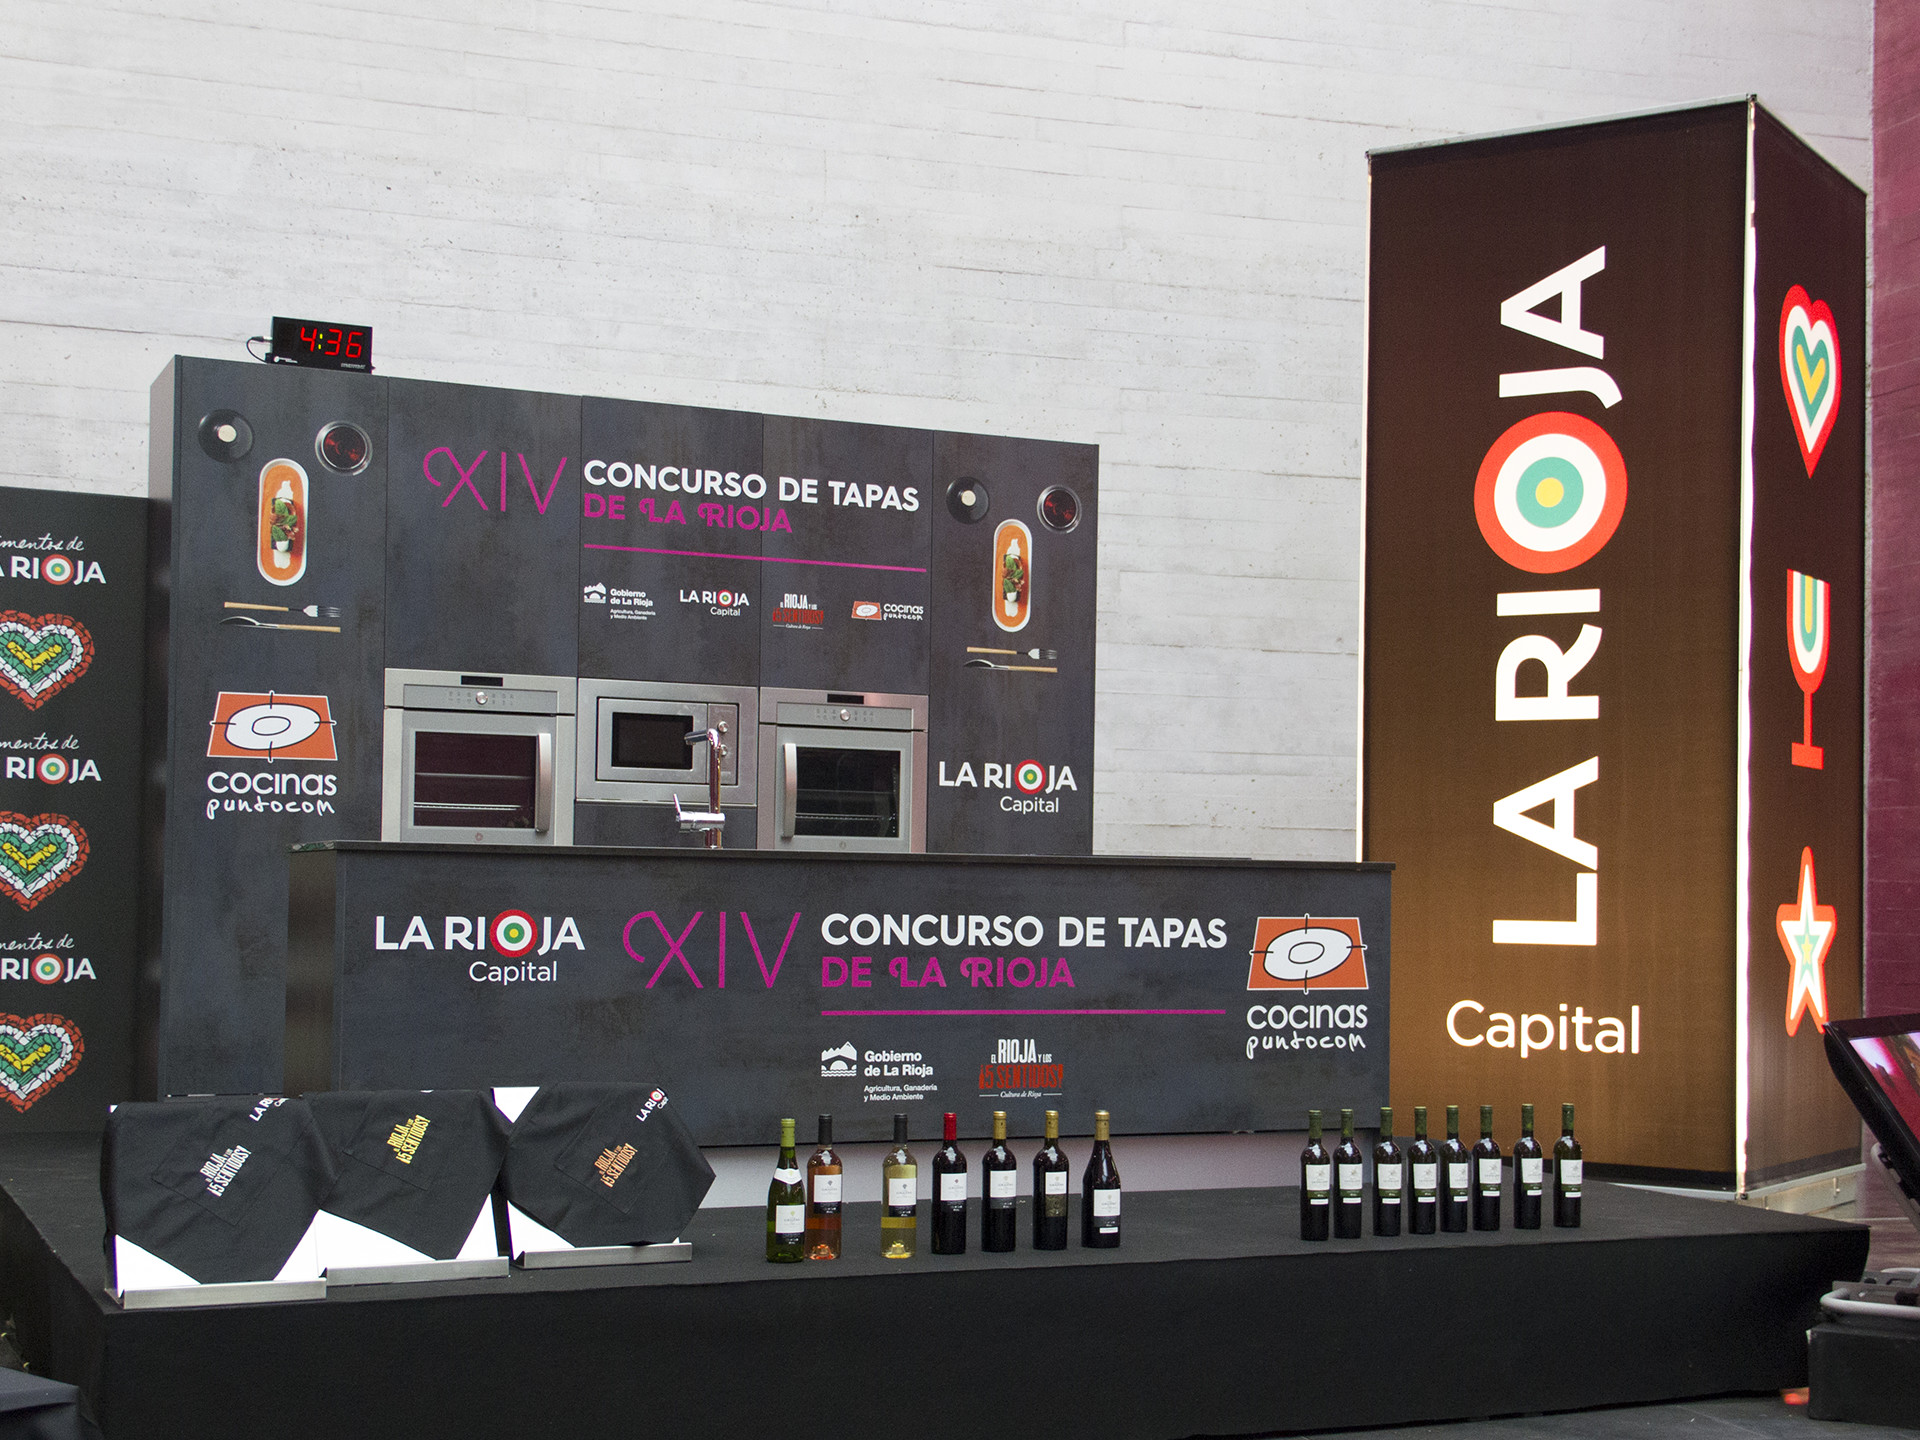 Diseño cocina evento XIV concurso de tapas de La Rioja